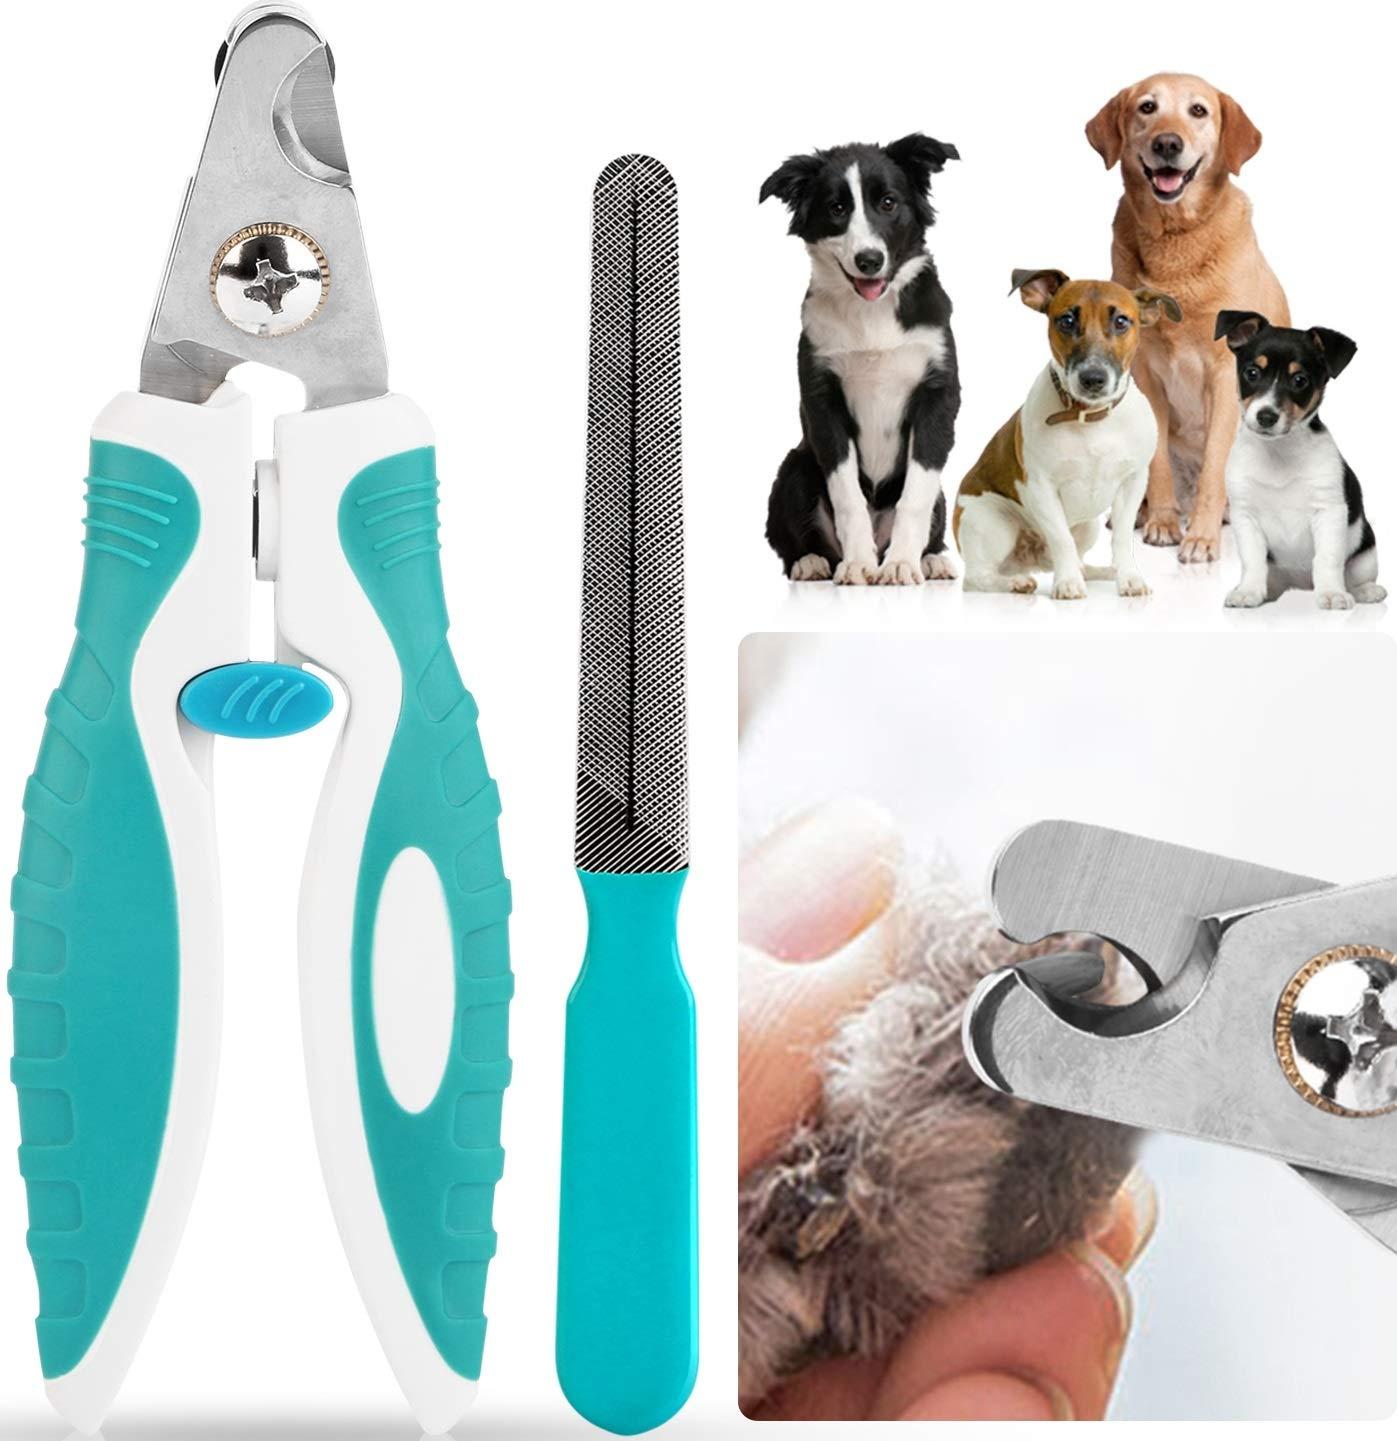 iMounTEK Stainless Steel Professional Pet Dog Nail Trimmer. Razor Sharp Blades, Safety Lock, Ergonomic Design Home Grooming Clipper- Cat/Rabbit/Bird/Puppy. Free Nail File!